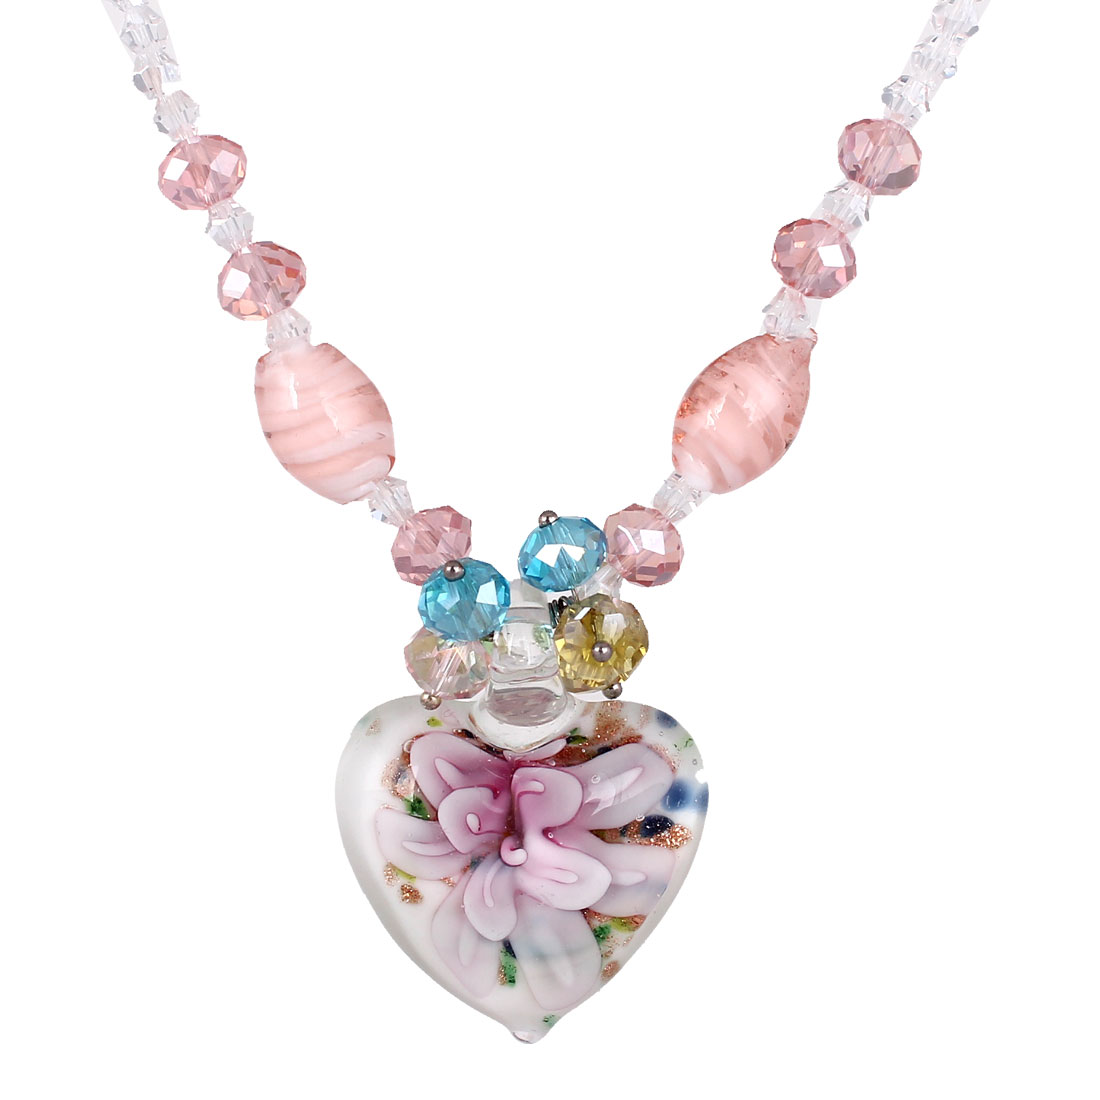 White Rhinestone Inlaid Neck String Glitter Powder Heart Flower Press Glass Pendant Necklace for Lady